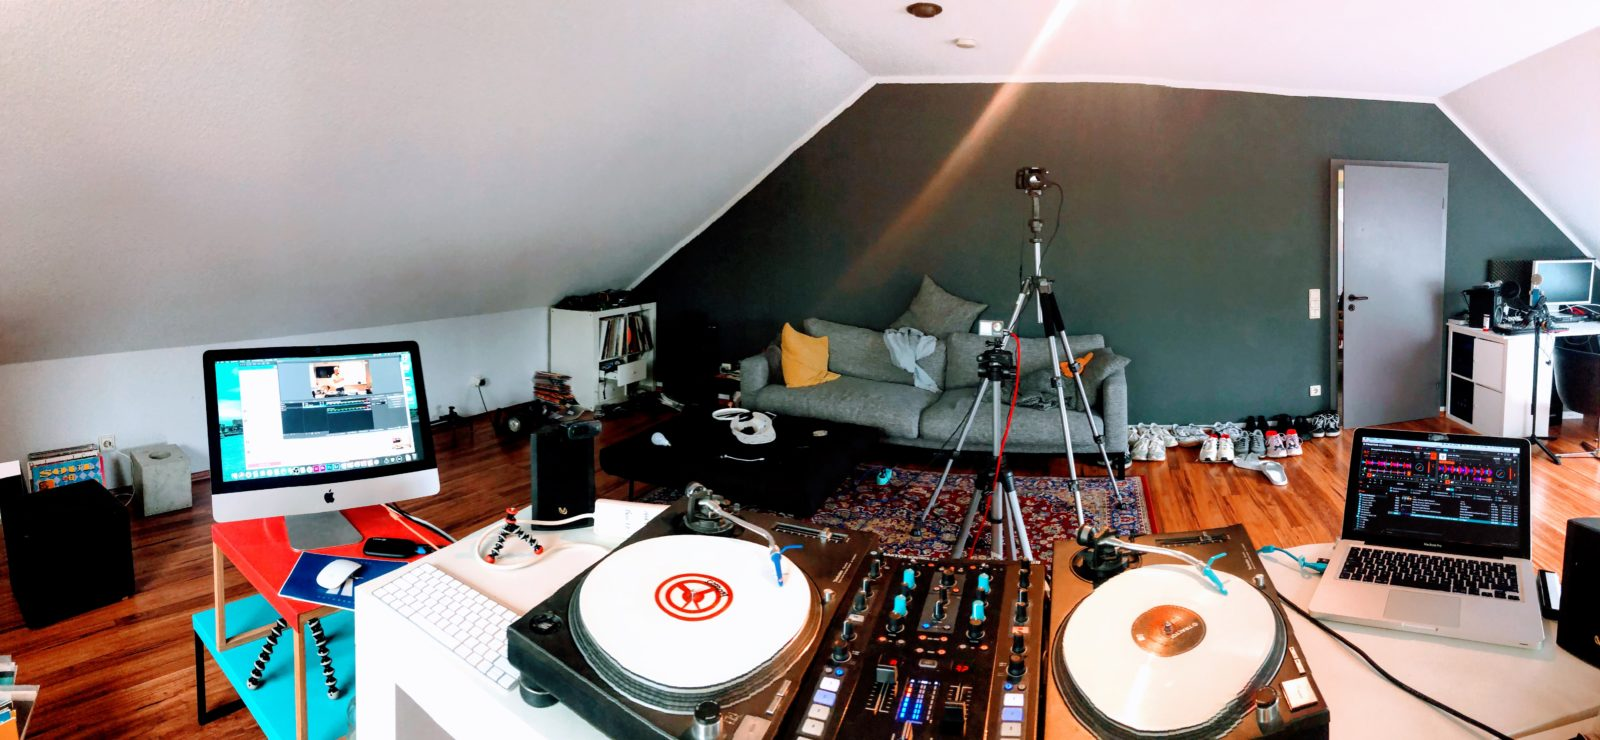 The Wollium streaming setup